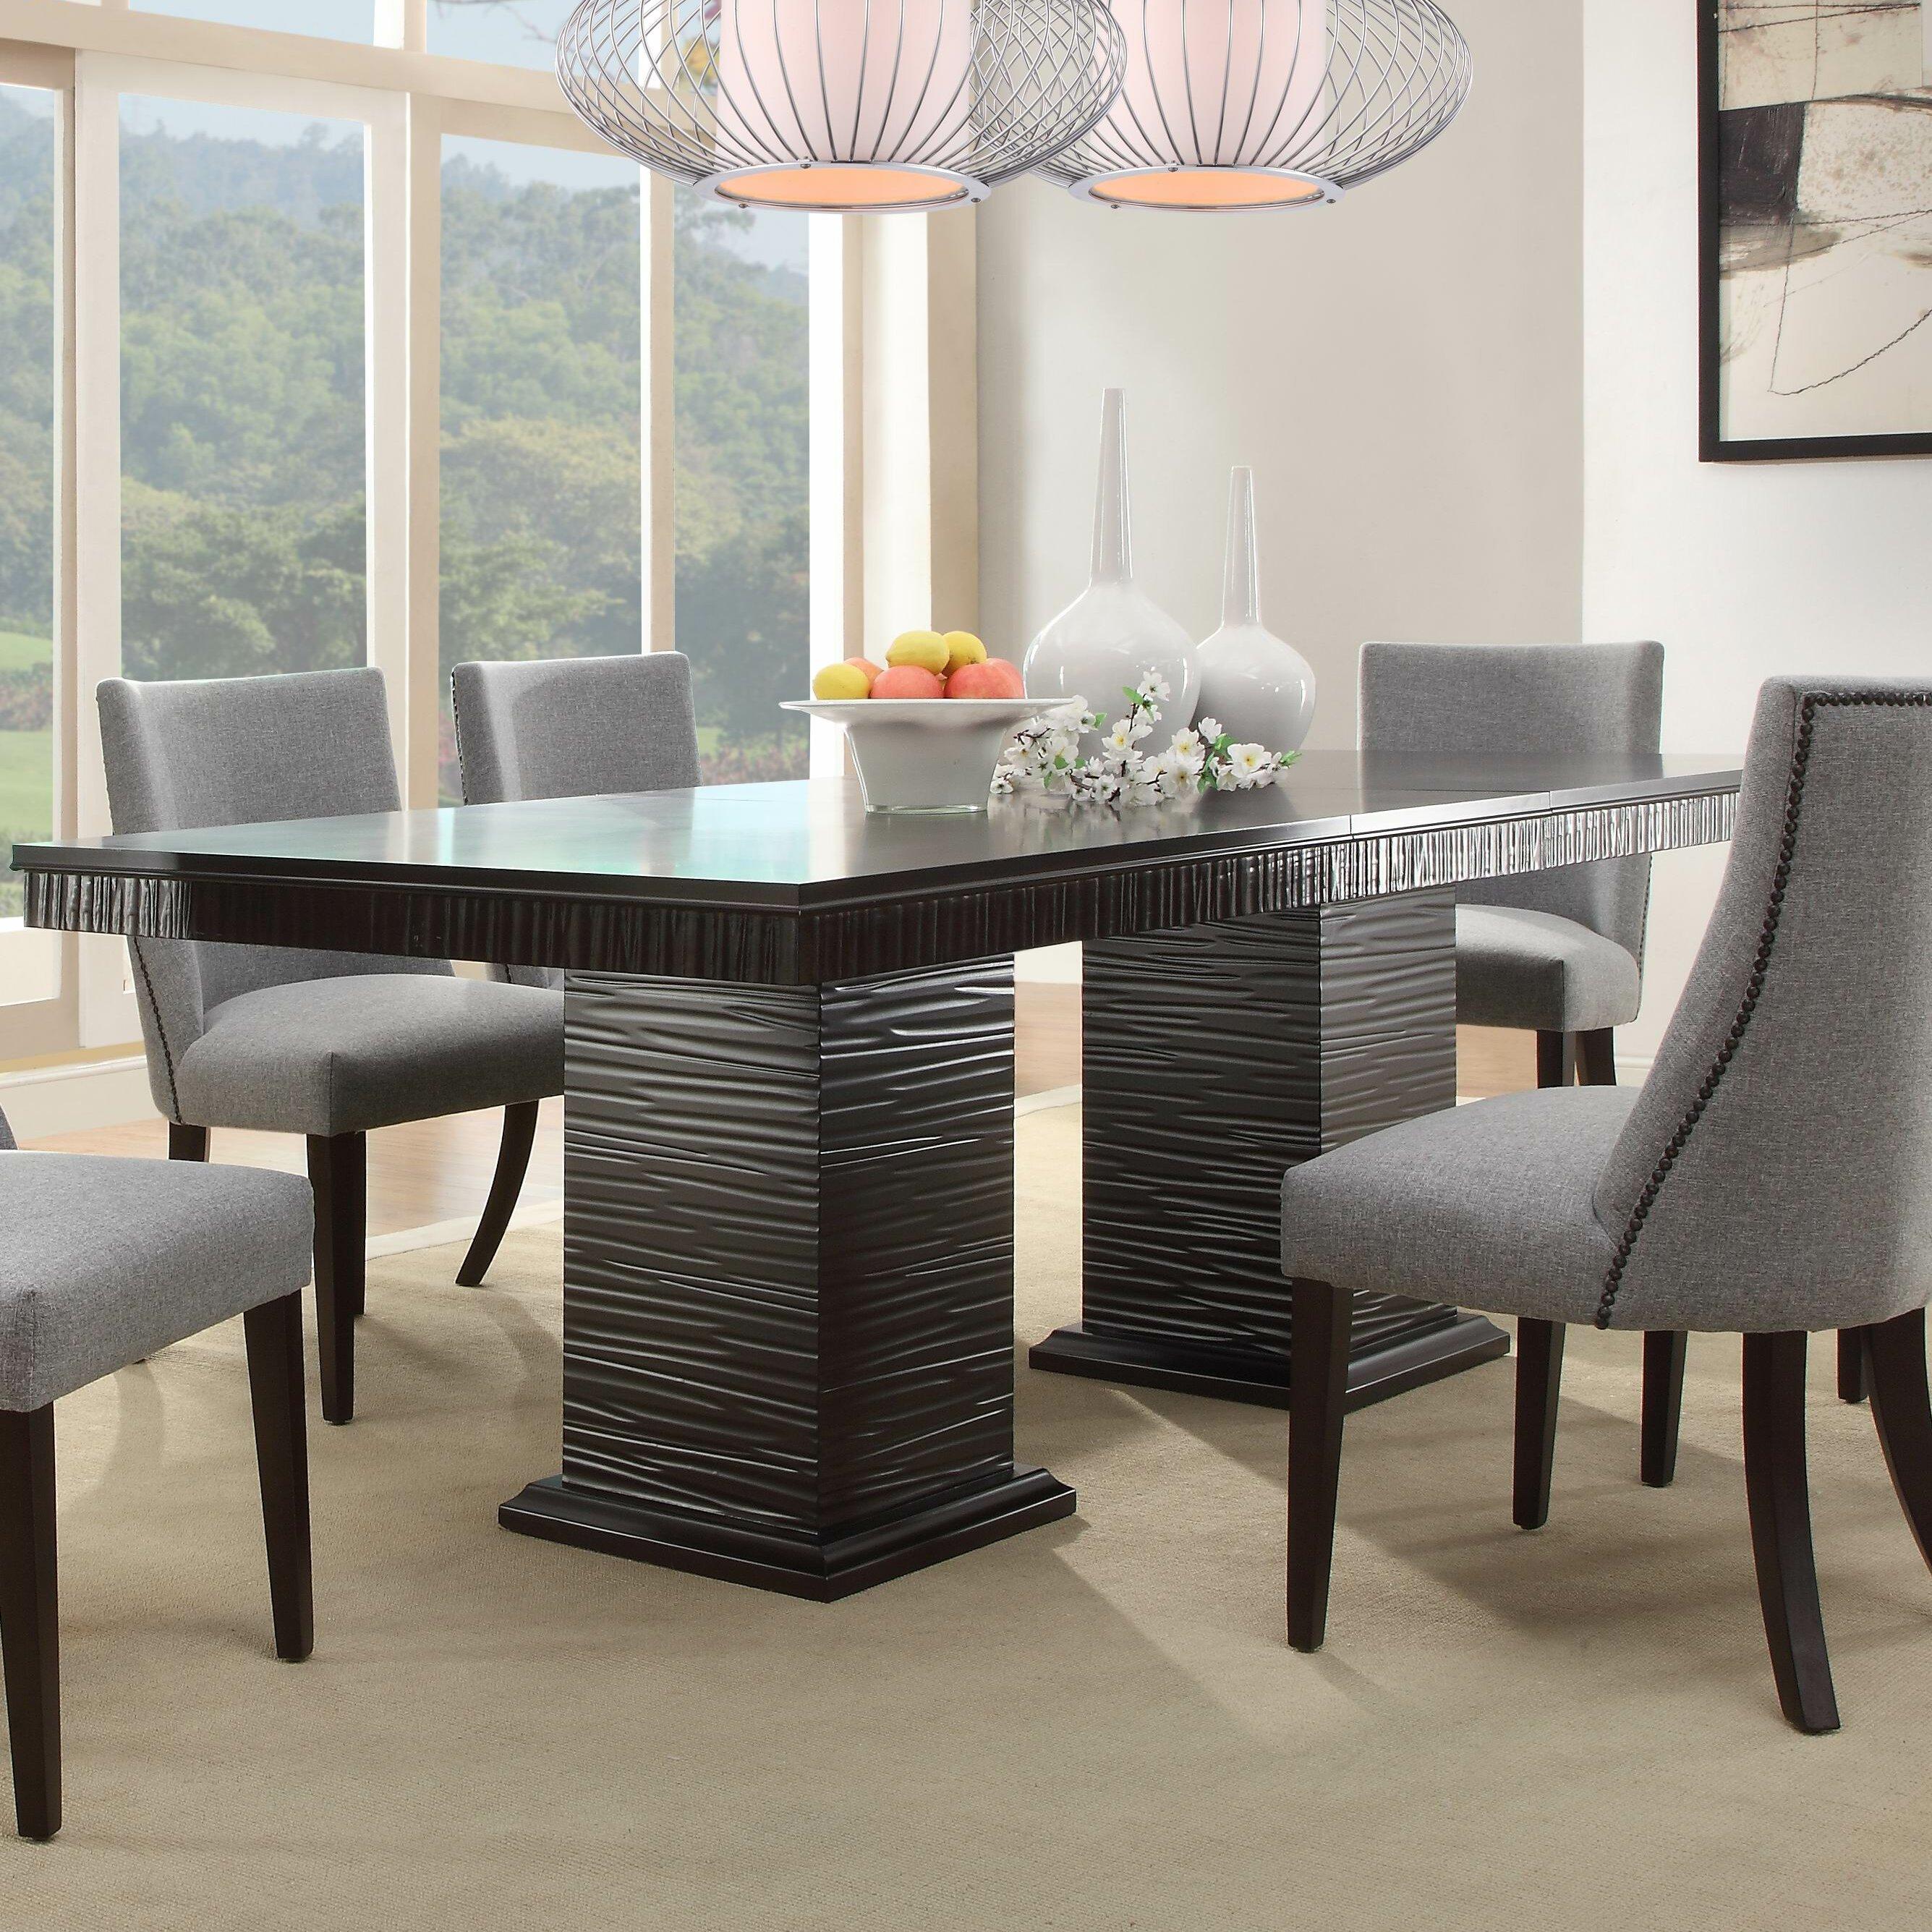 Cadogan extendable dining table reviews joss main